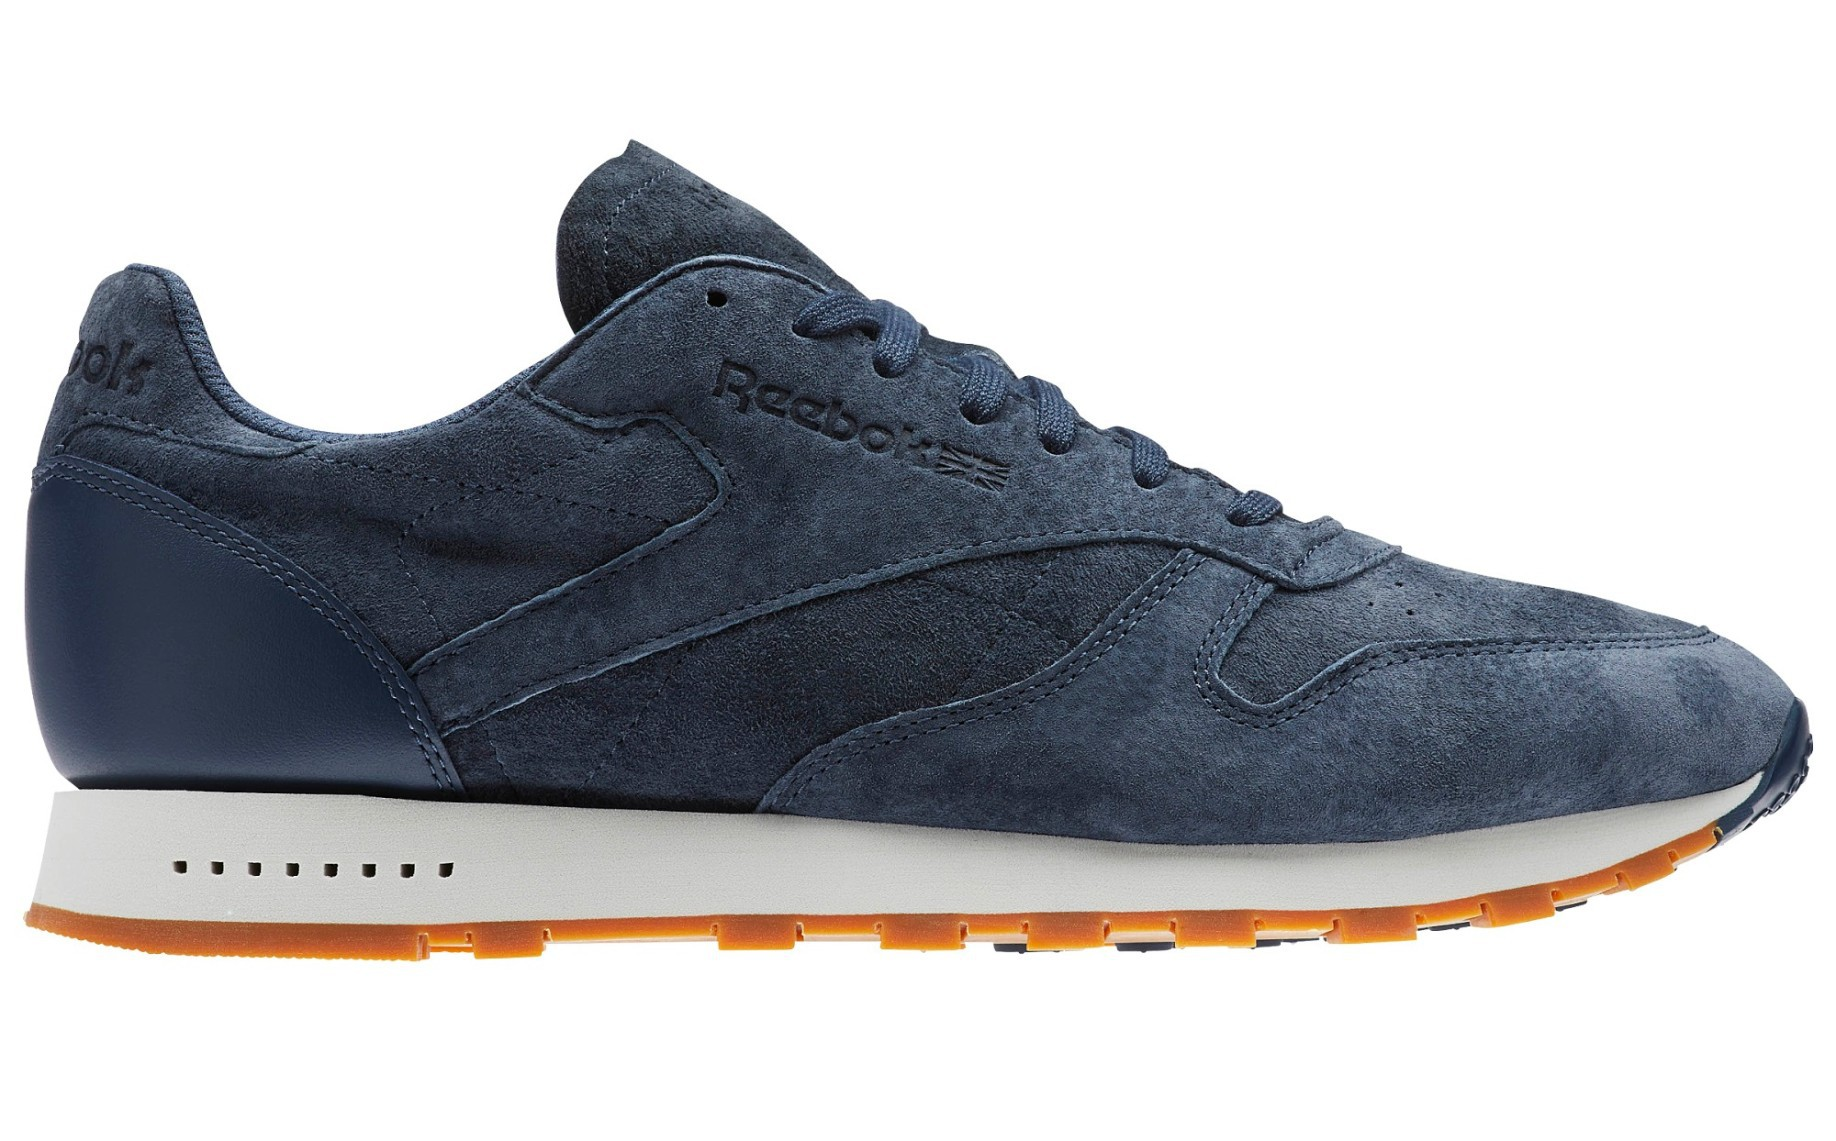 322471997da Shoes mens CL Leather SG colore Blue - Reebok - SportIT.com